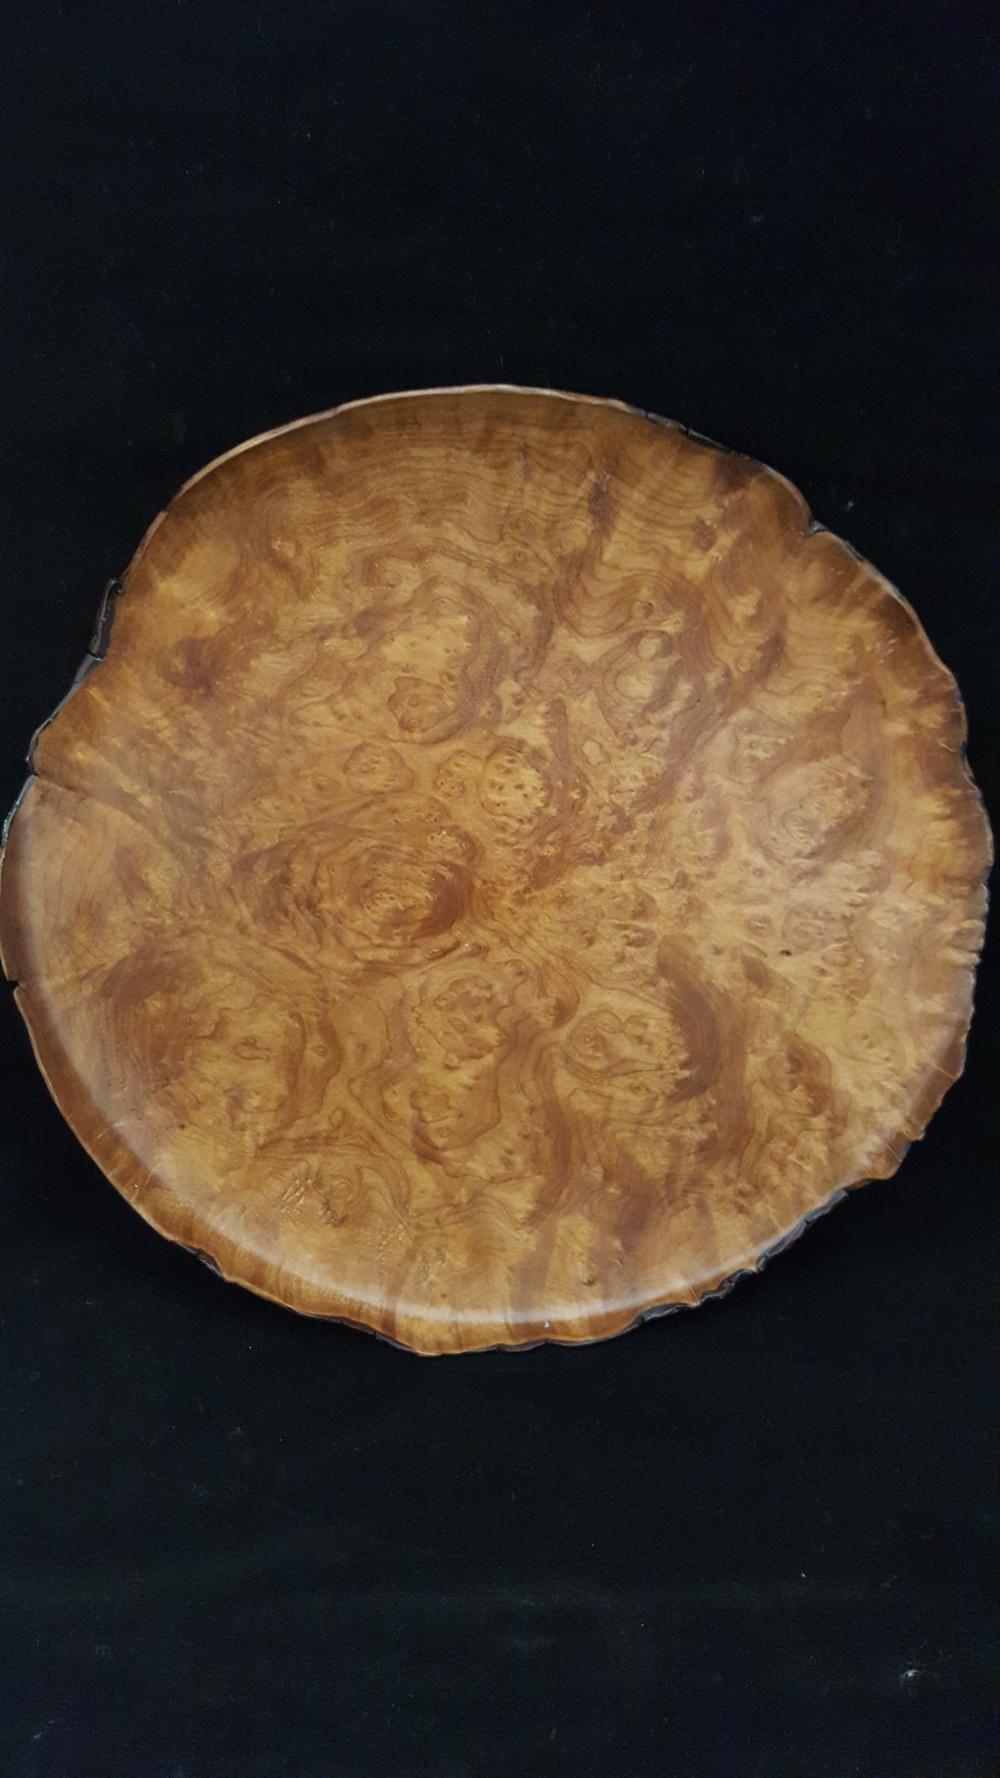 Madrone Burl Platter